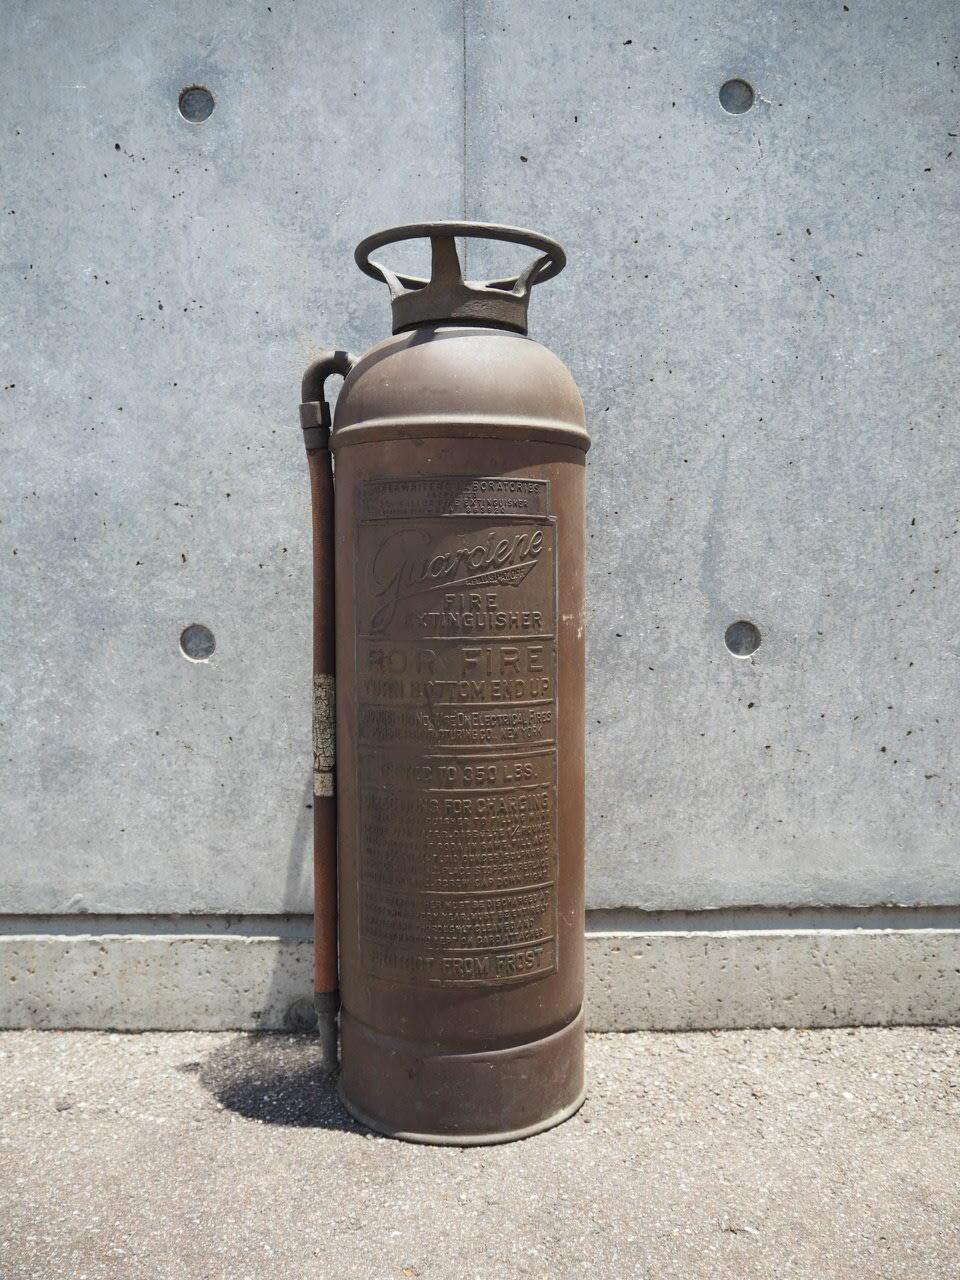 品番1130 消火器 / Fire extinguisher 011